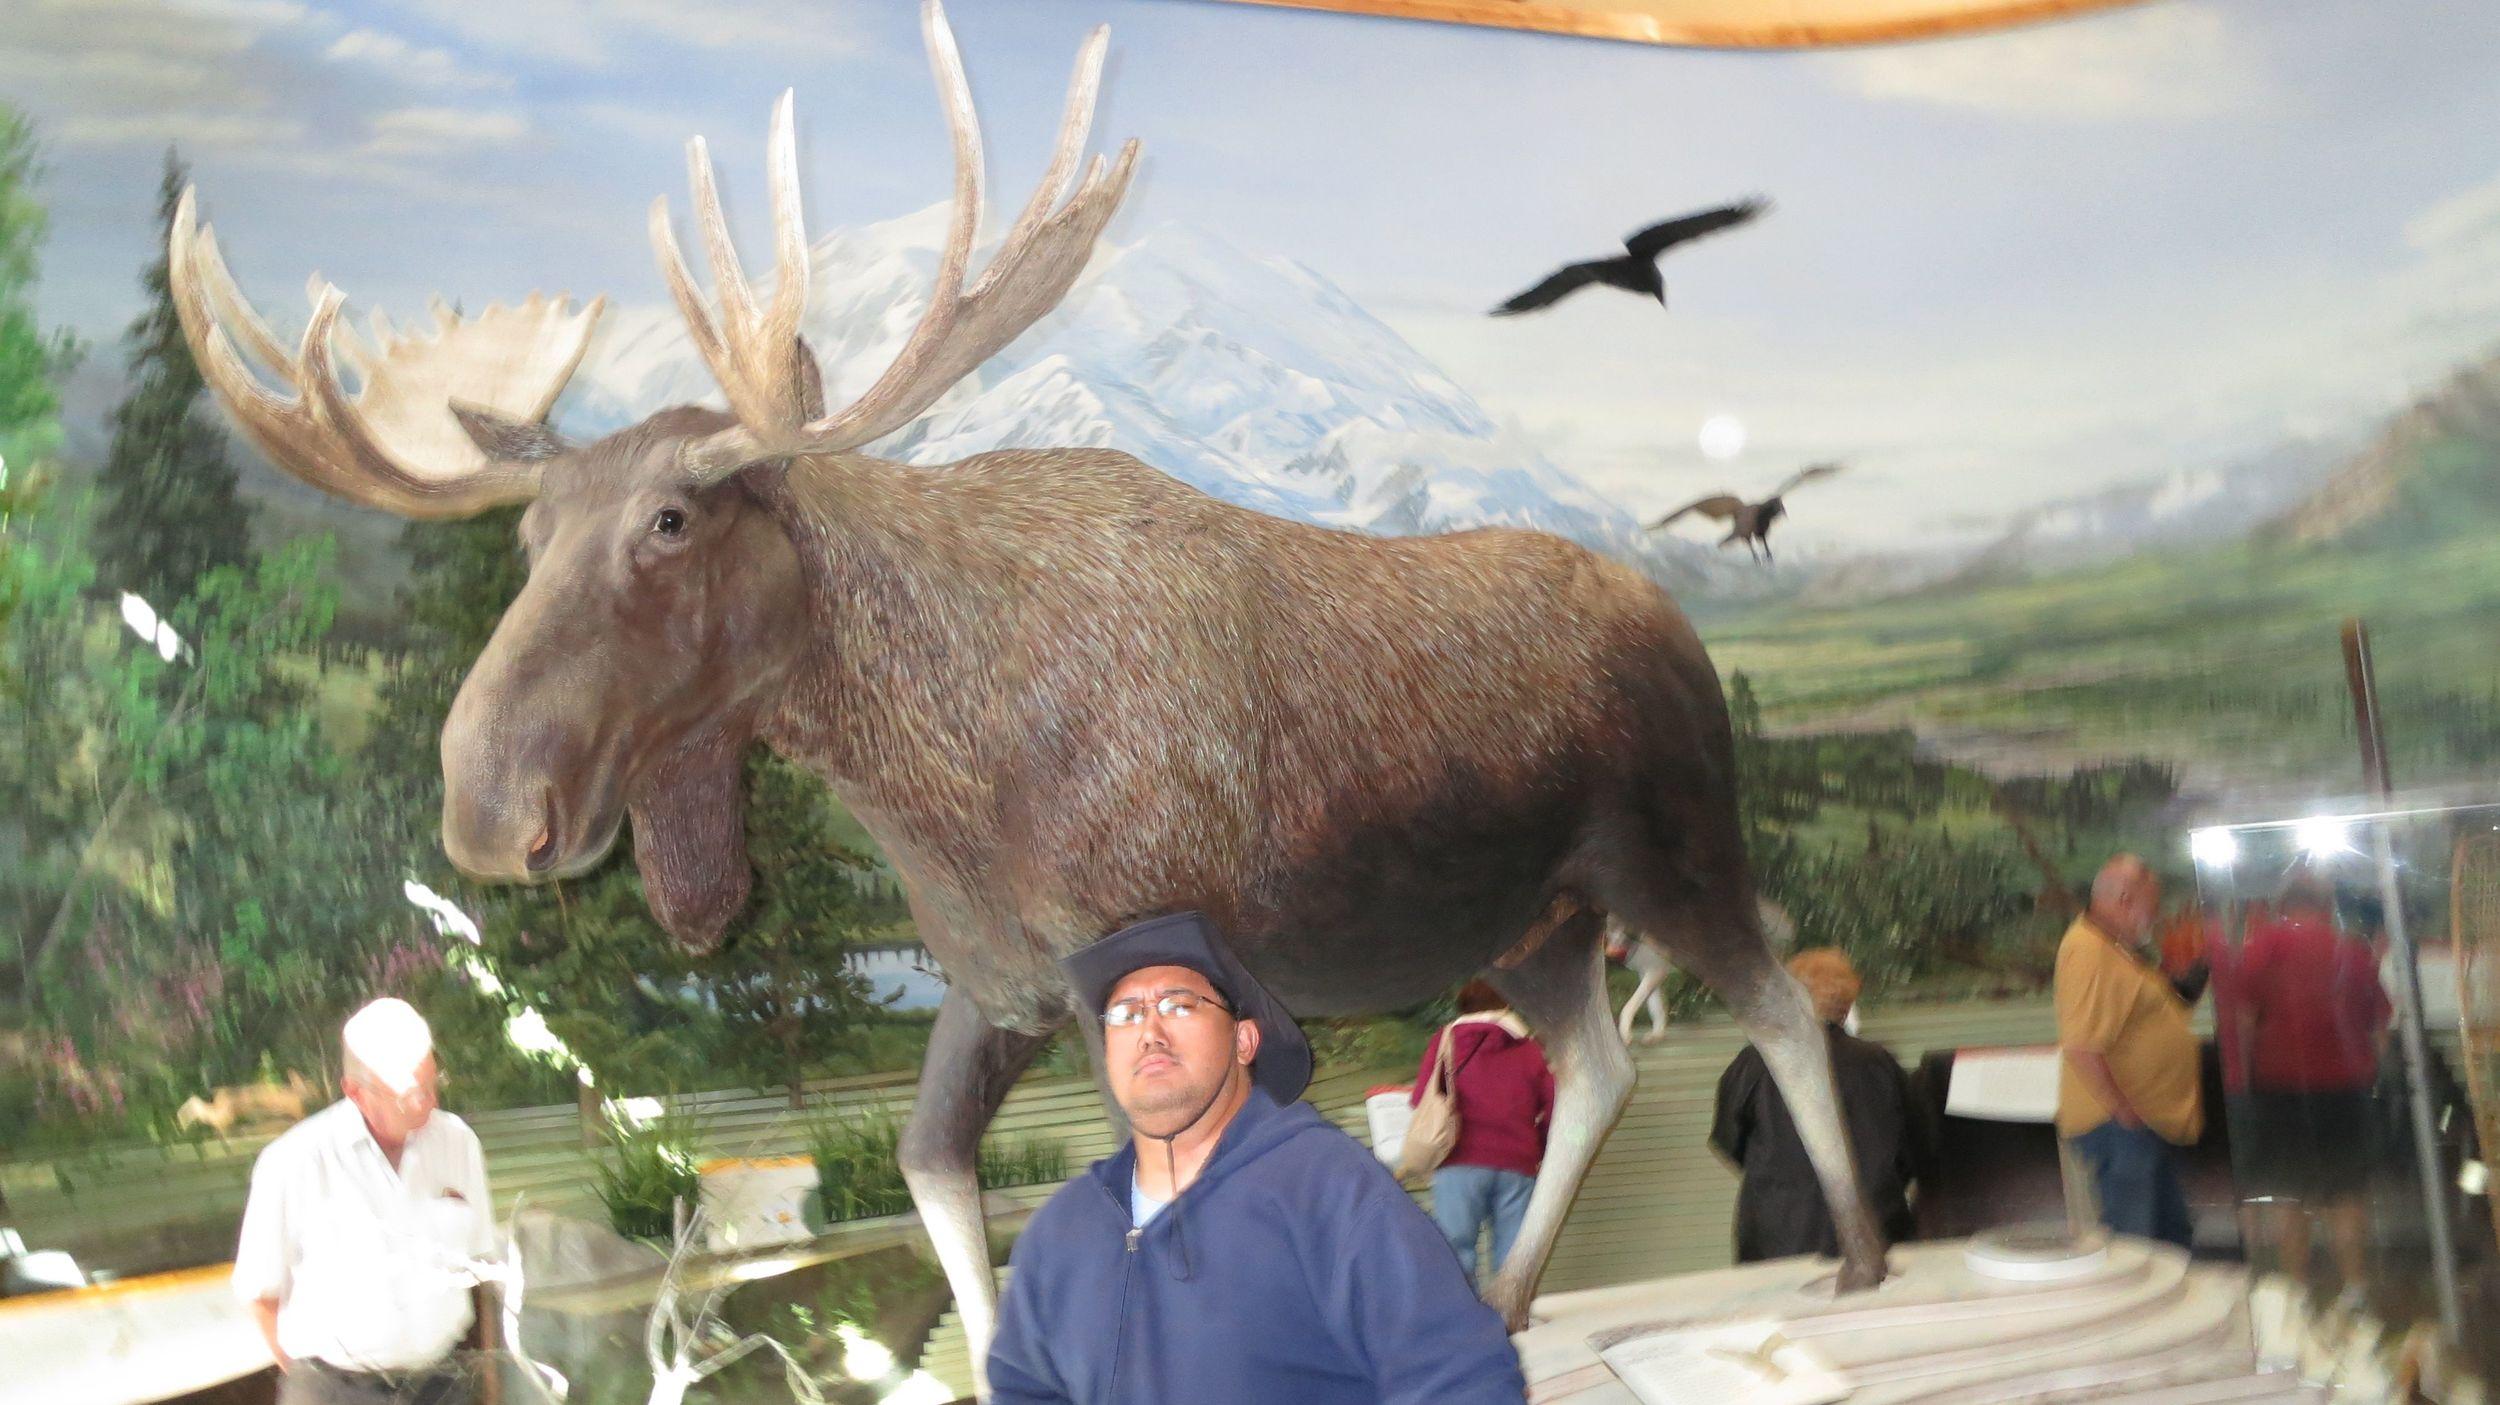 Mike and fake moose